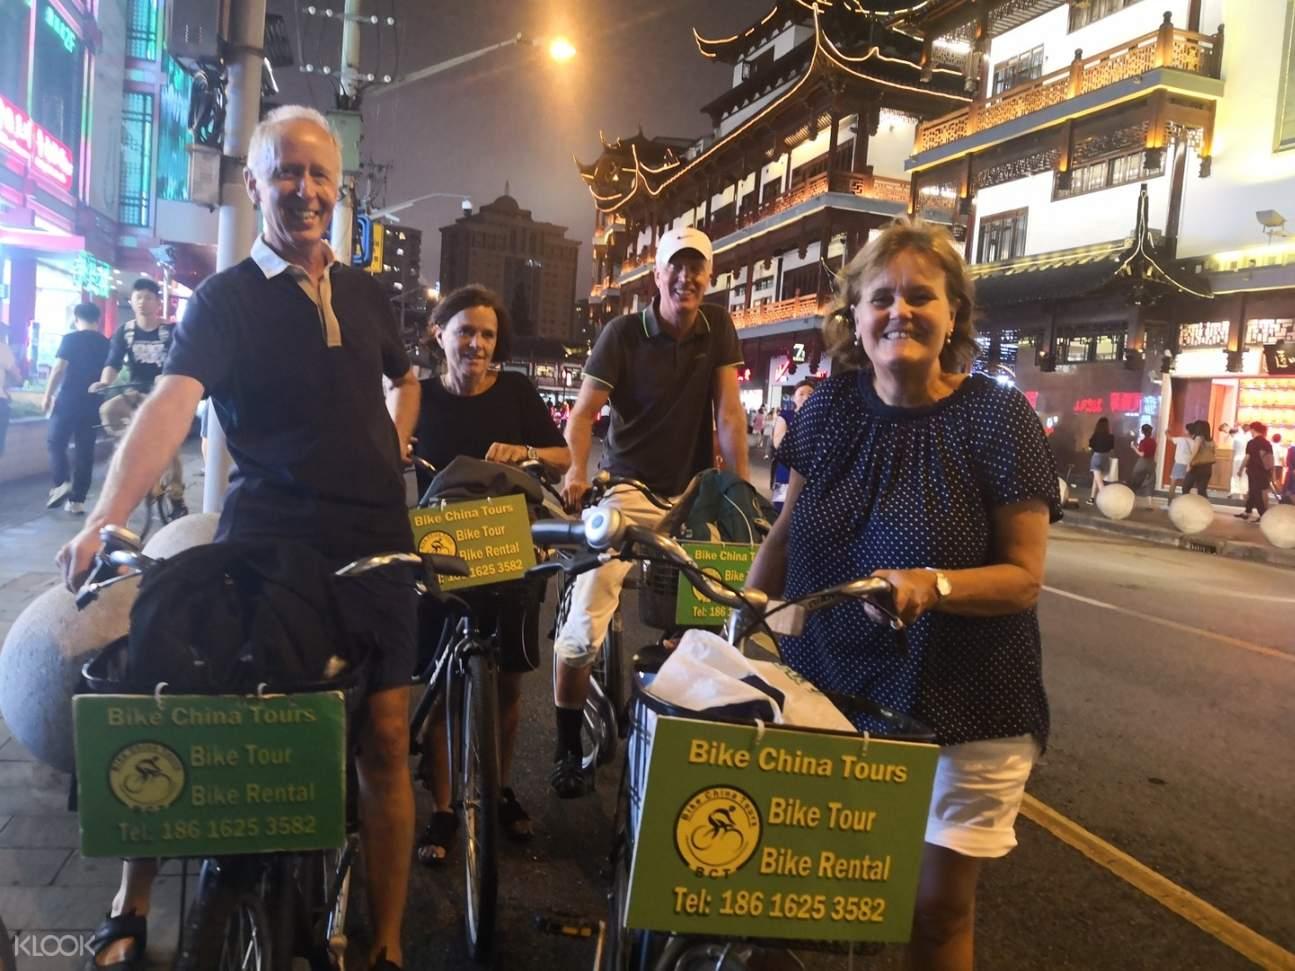 china bike tour in shanghai